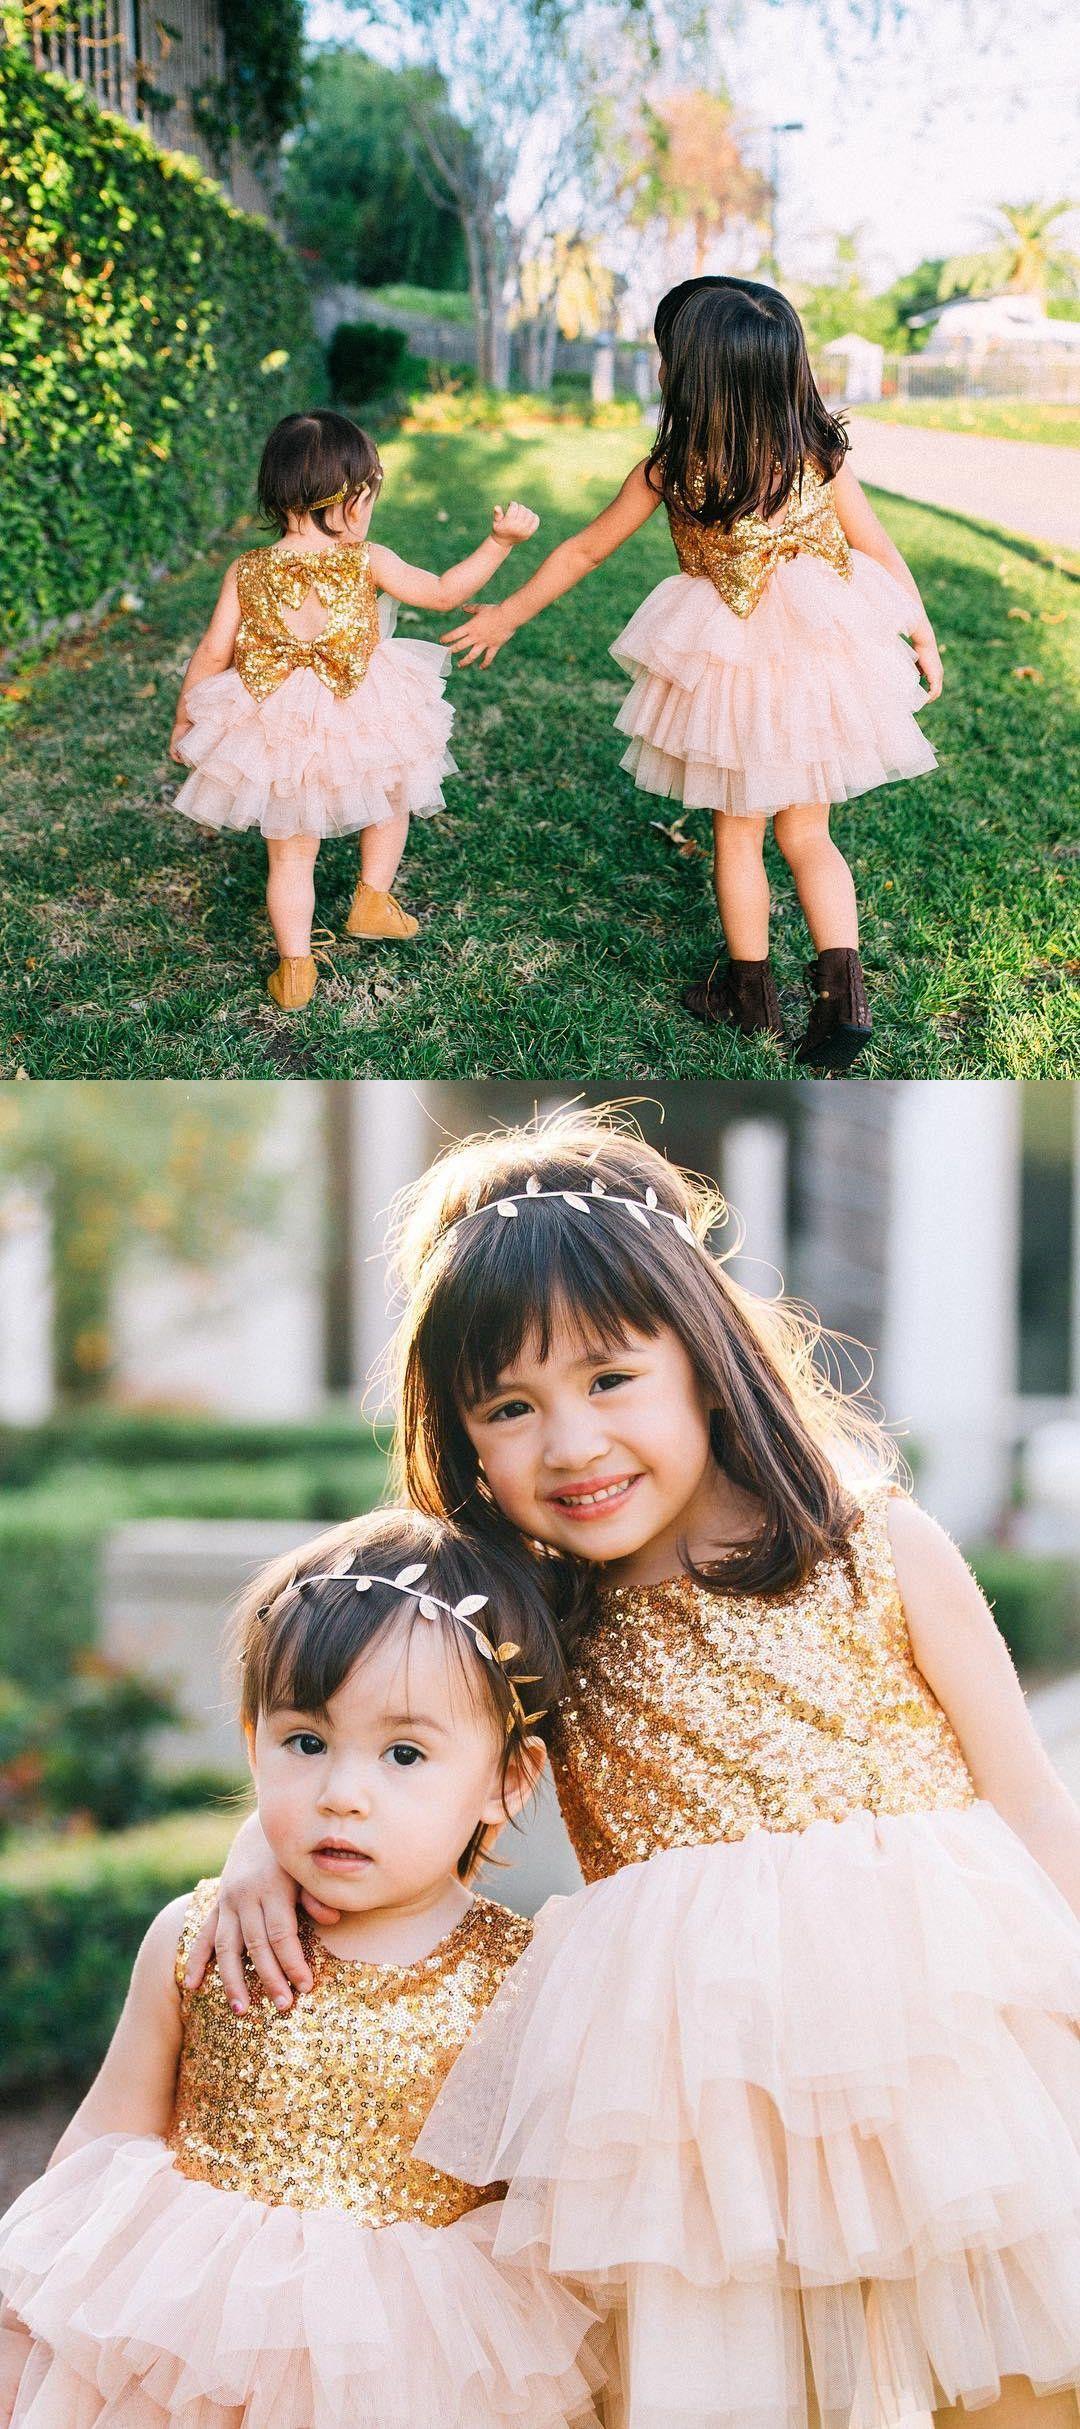 Princess gold sequins top pink flower girl dress from modseleystore